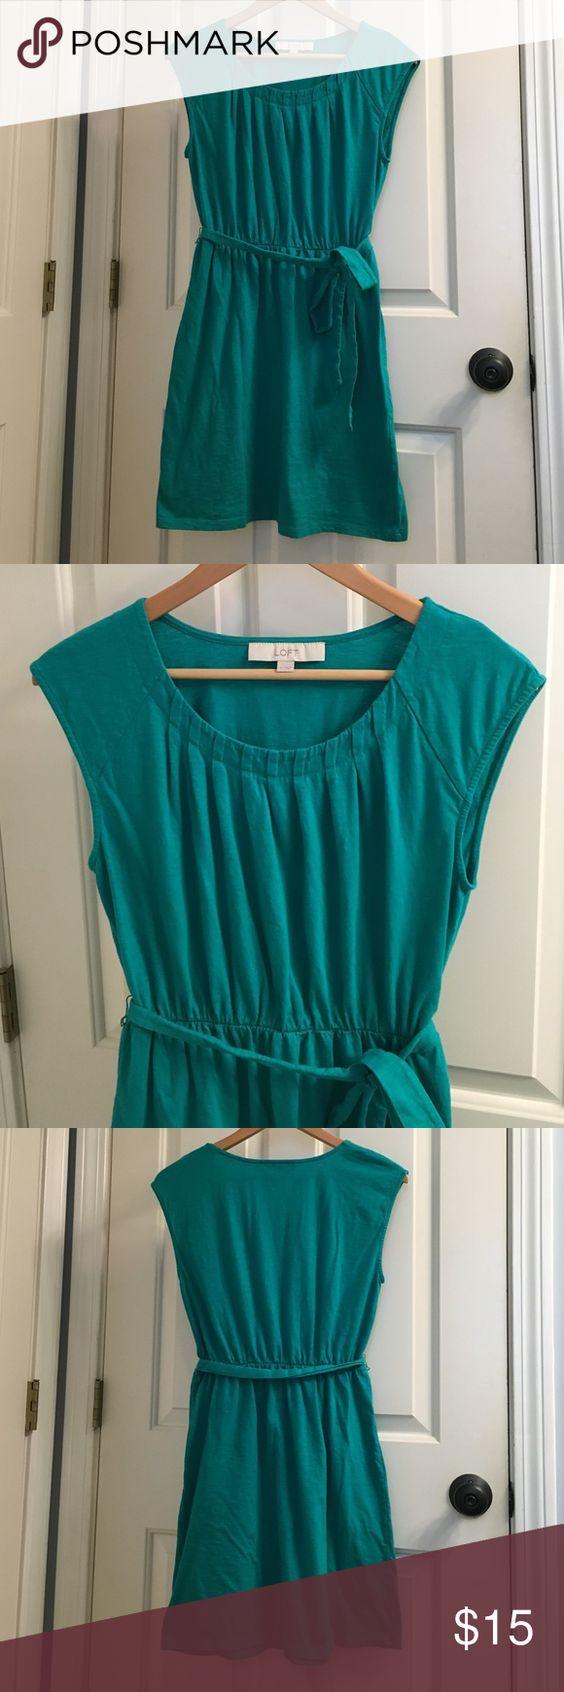 Loft slub cotton dress Beautiful green slub cotton sleeveless dress with pleated neckline, gathered waist and tie belt. Worn a few times but in excellent condition LOFT Dresses